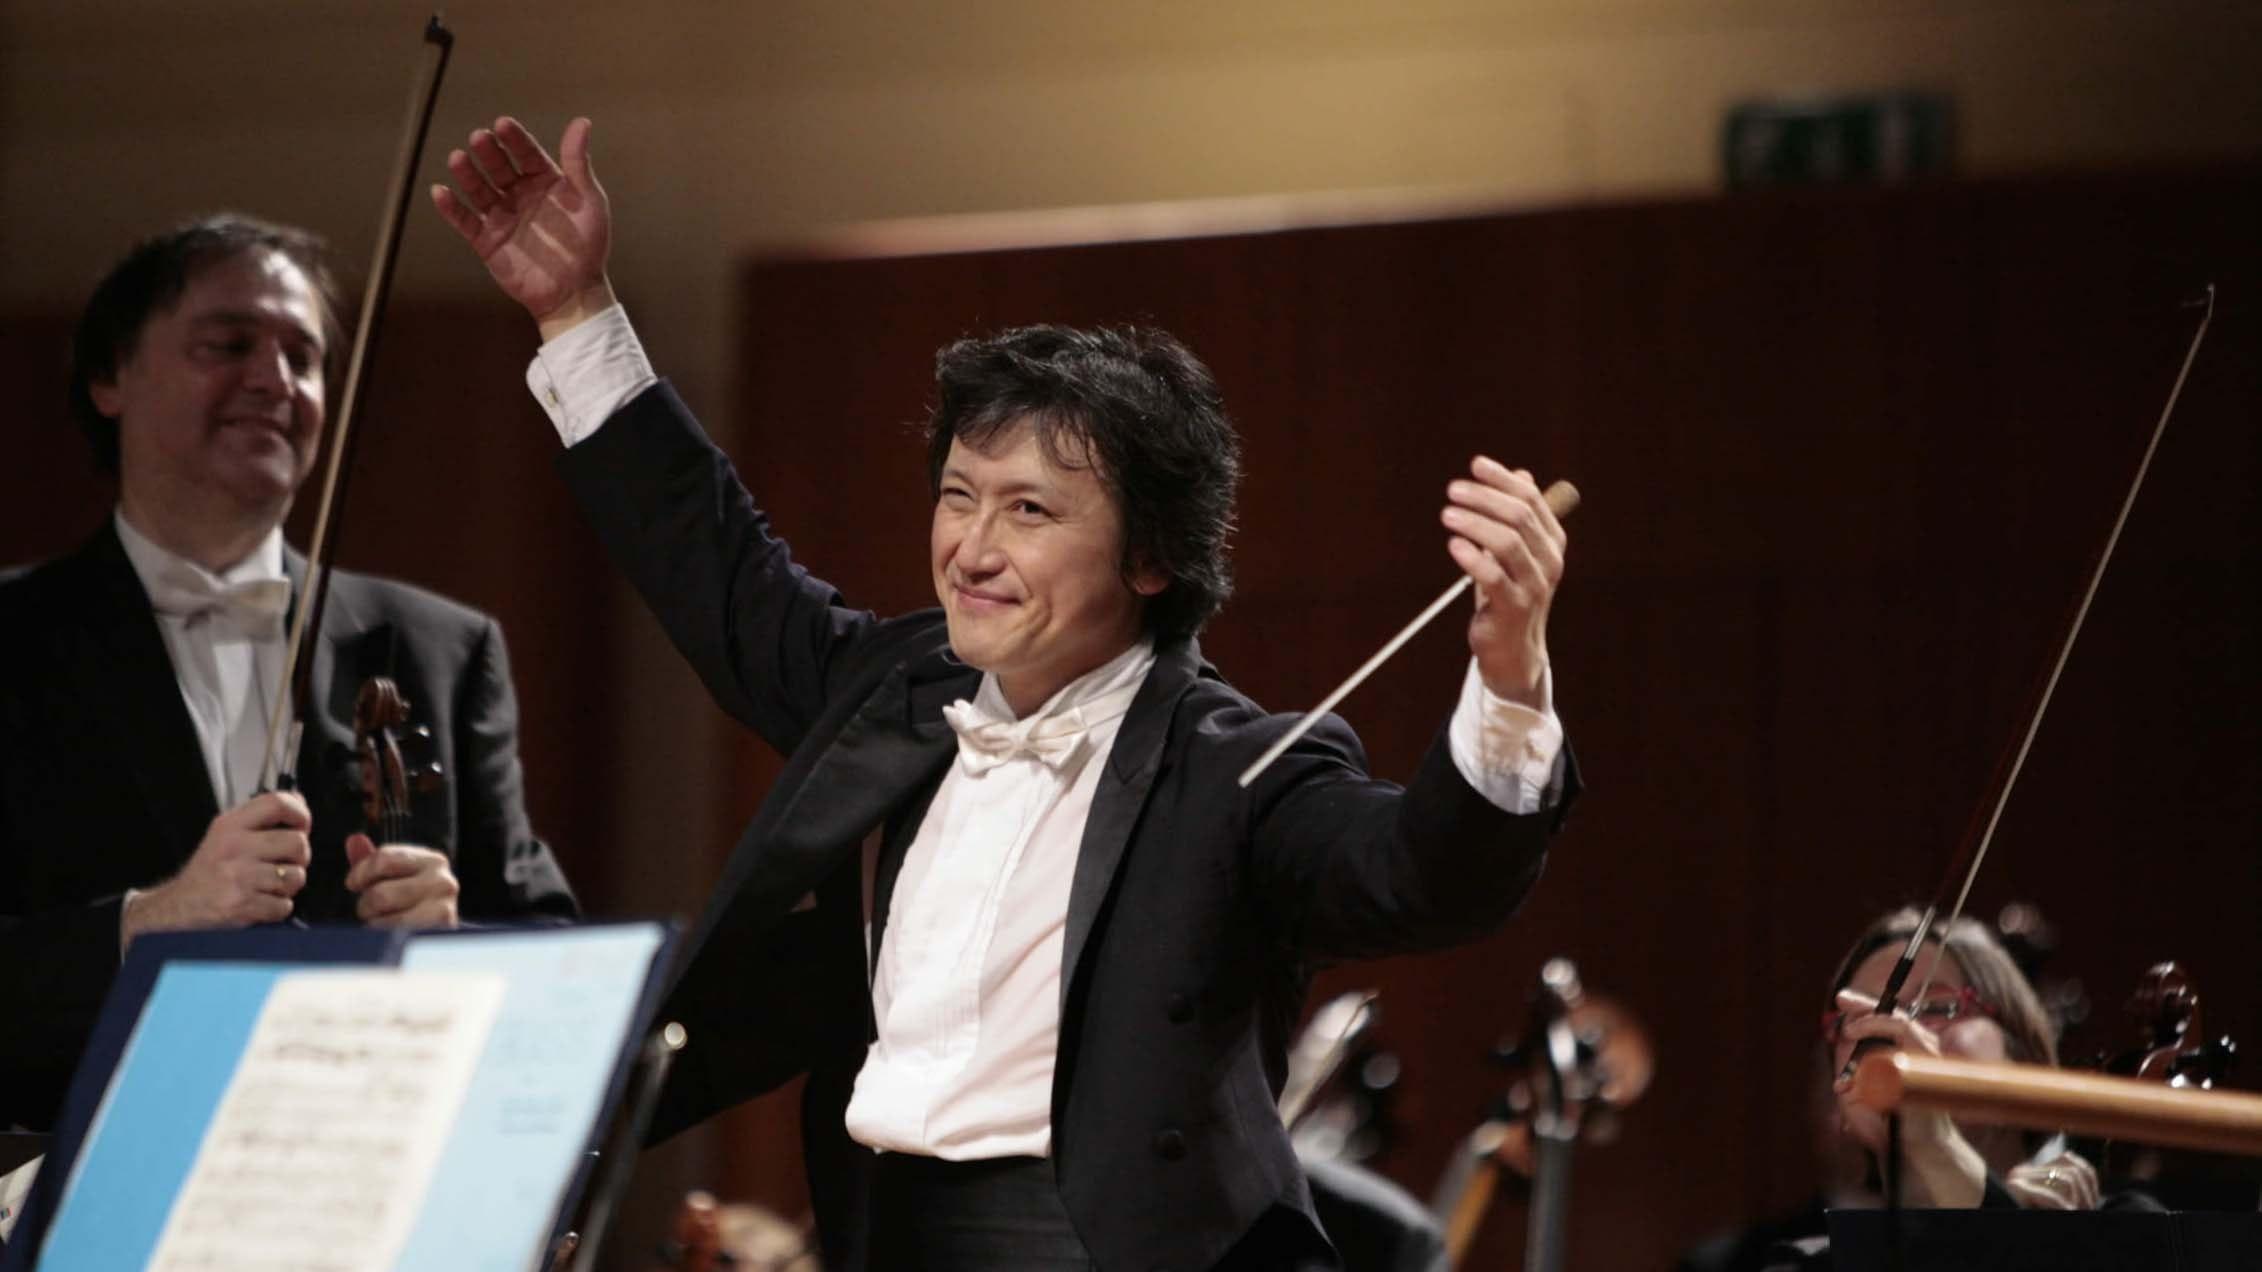 Kazushi Ono conducts Vivancos, Toru Takemitsu, Mozart, and Fauré's Requiem